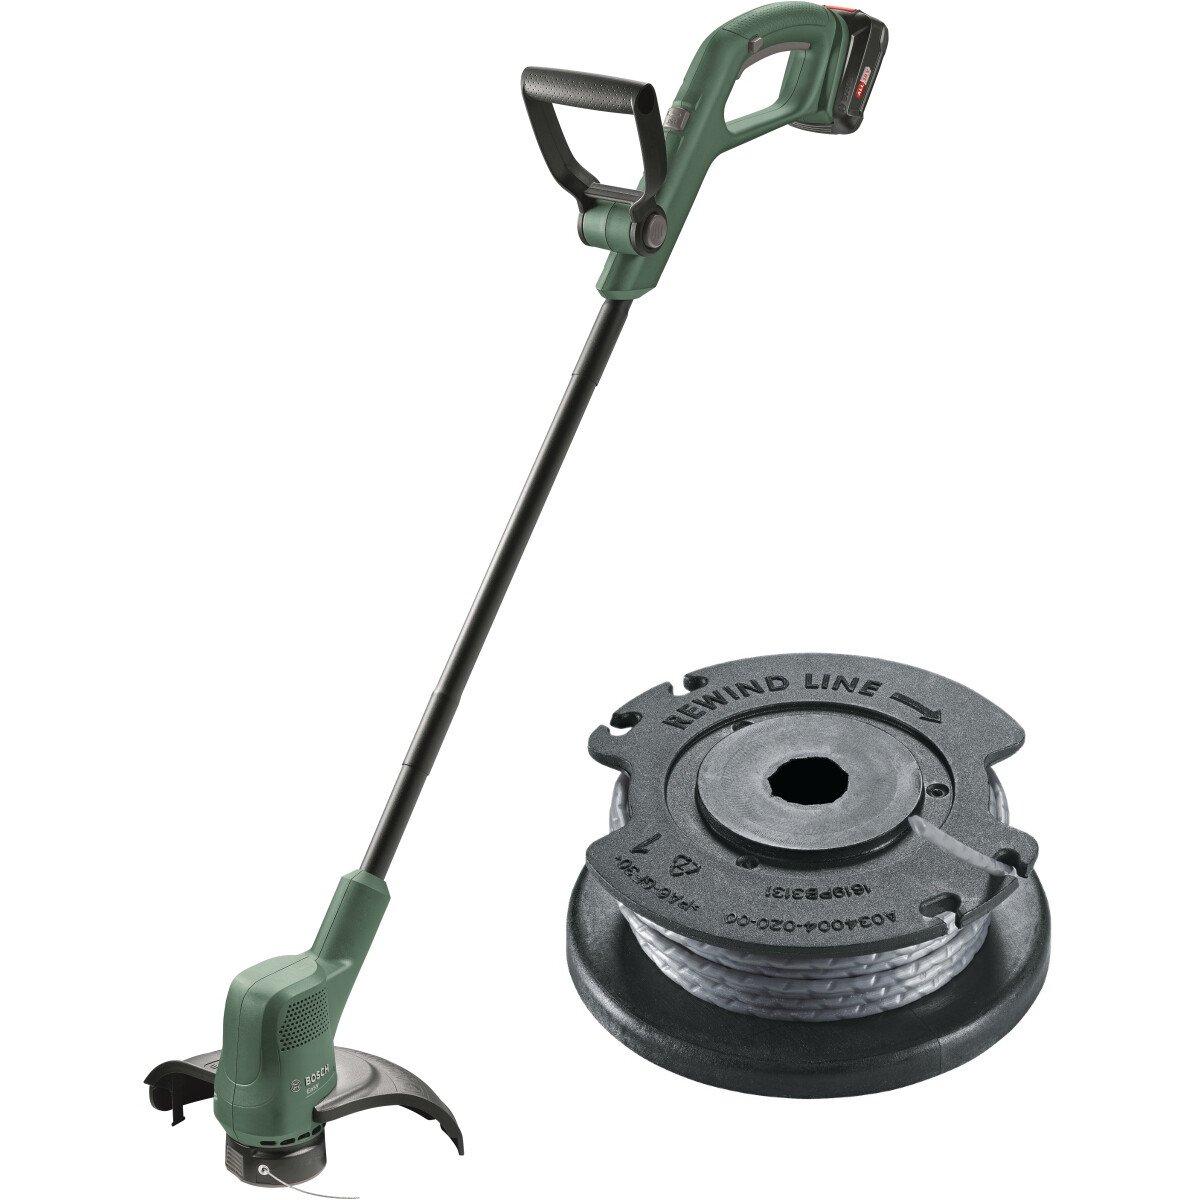 Bosch EasyGrassCut 18-26 with Spare Spool 18V 26cm Grass Trimmer (1x2.5ah)